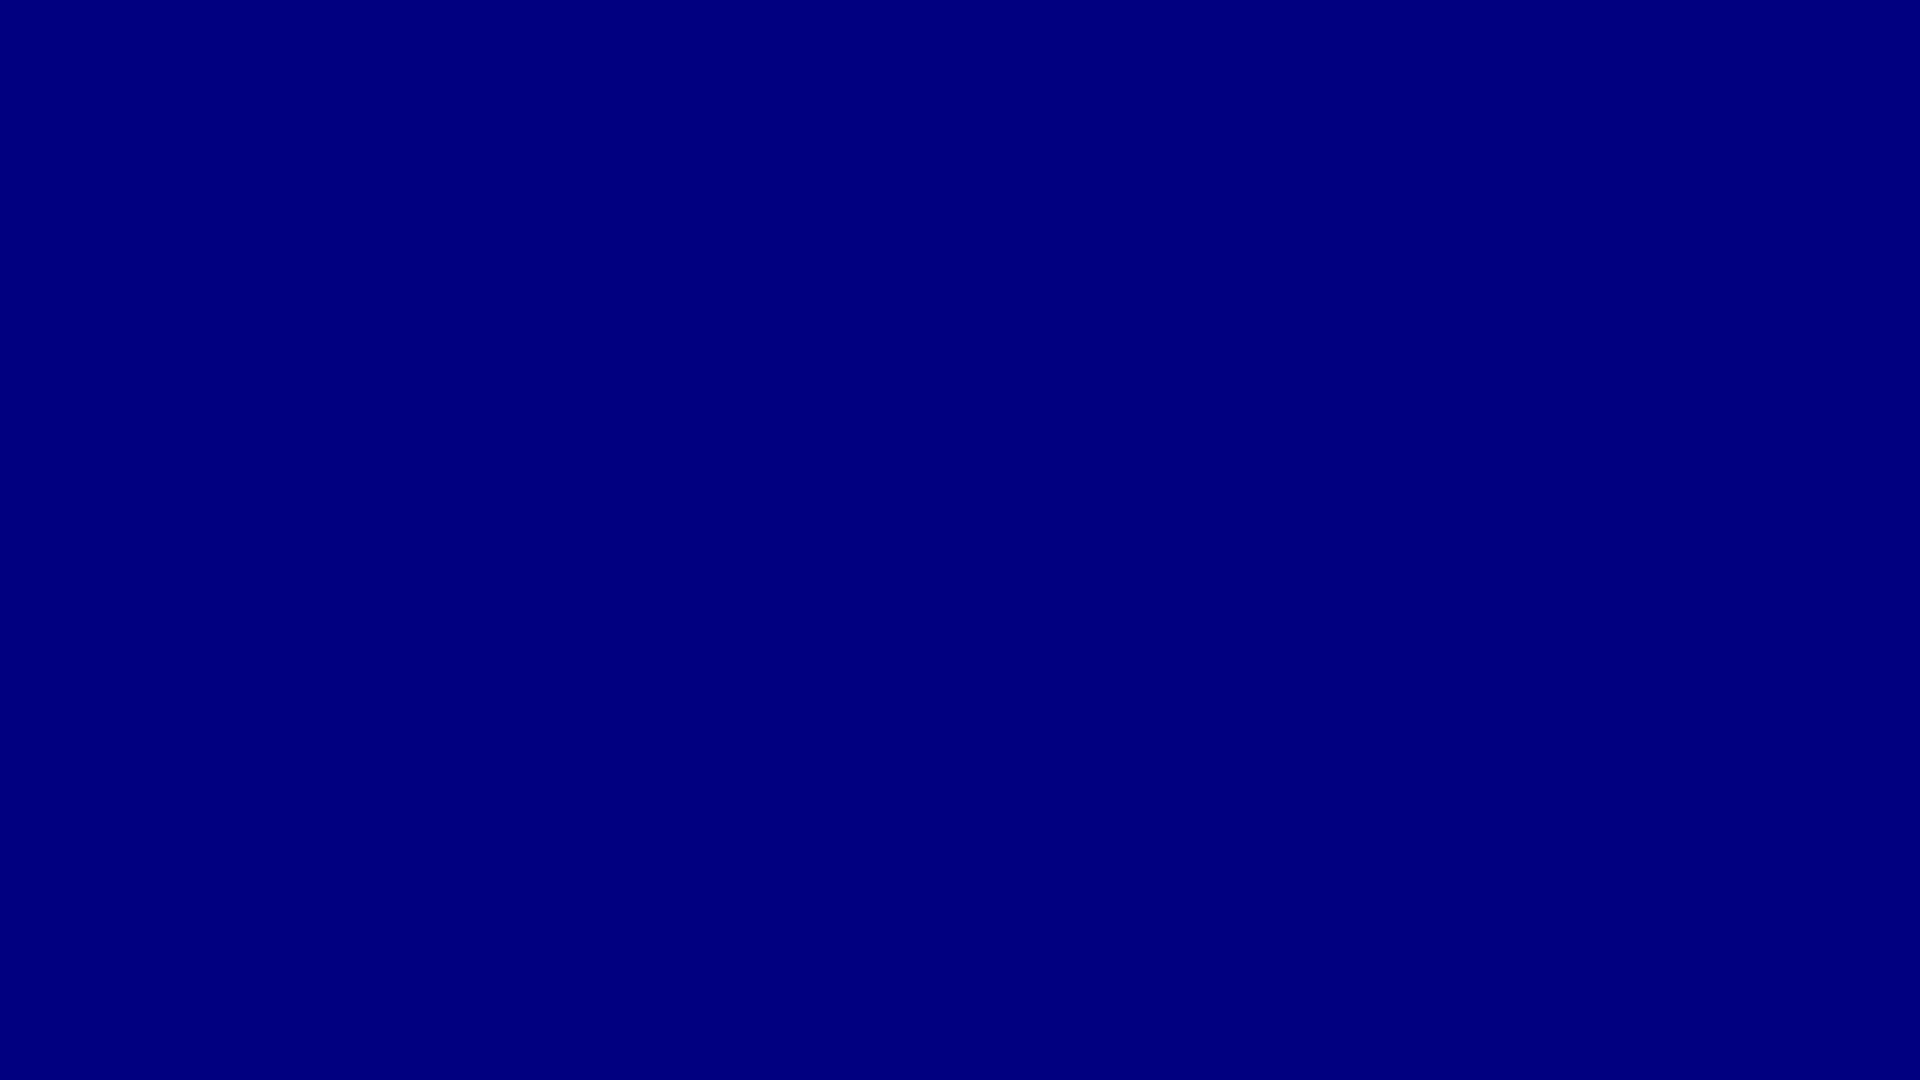 Navy Blue Wallpapers Plain Wallpaper 7629